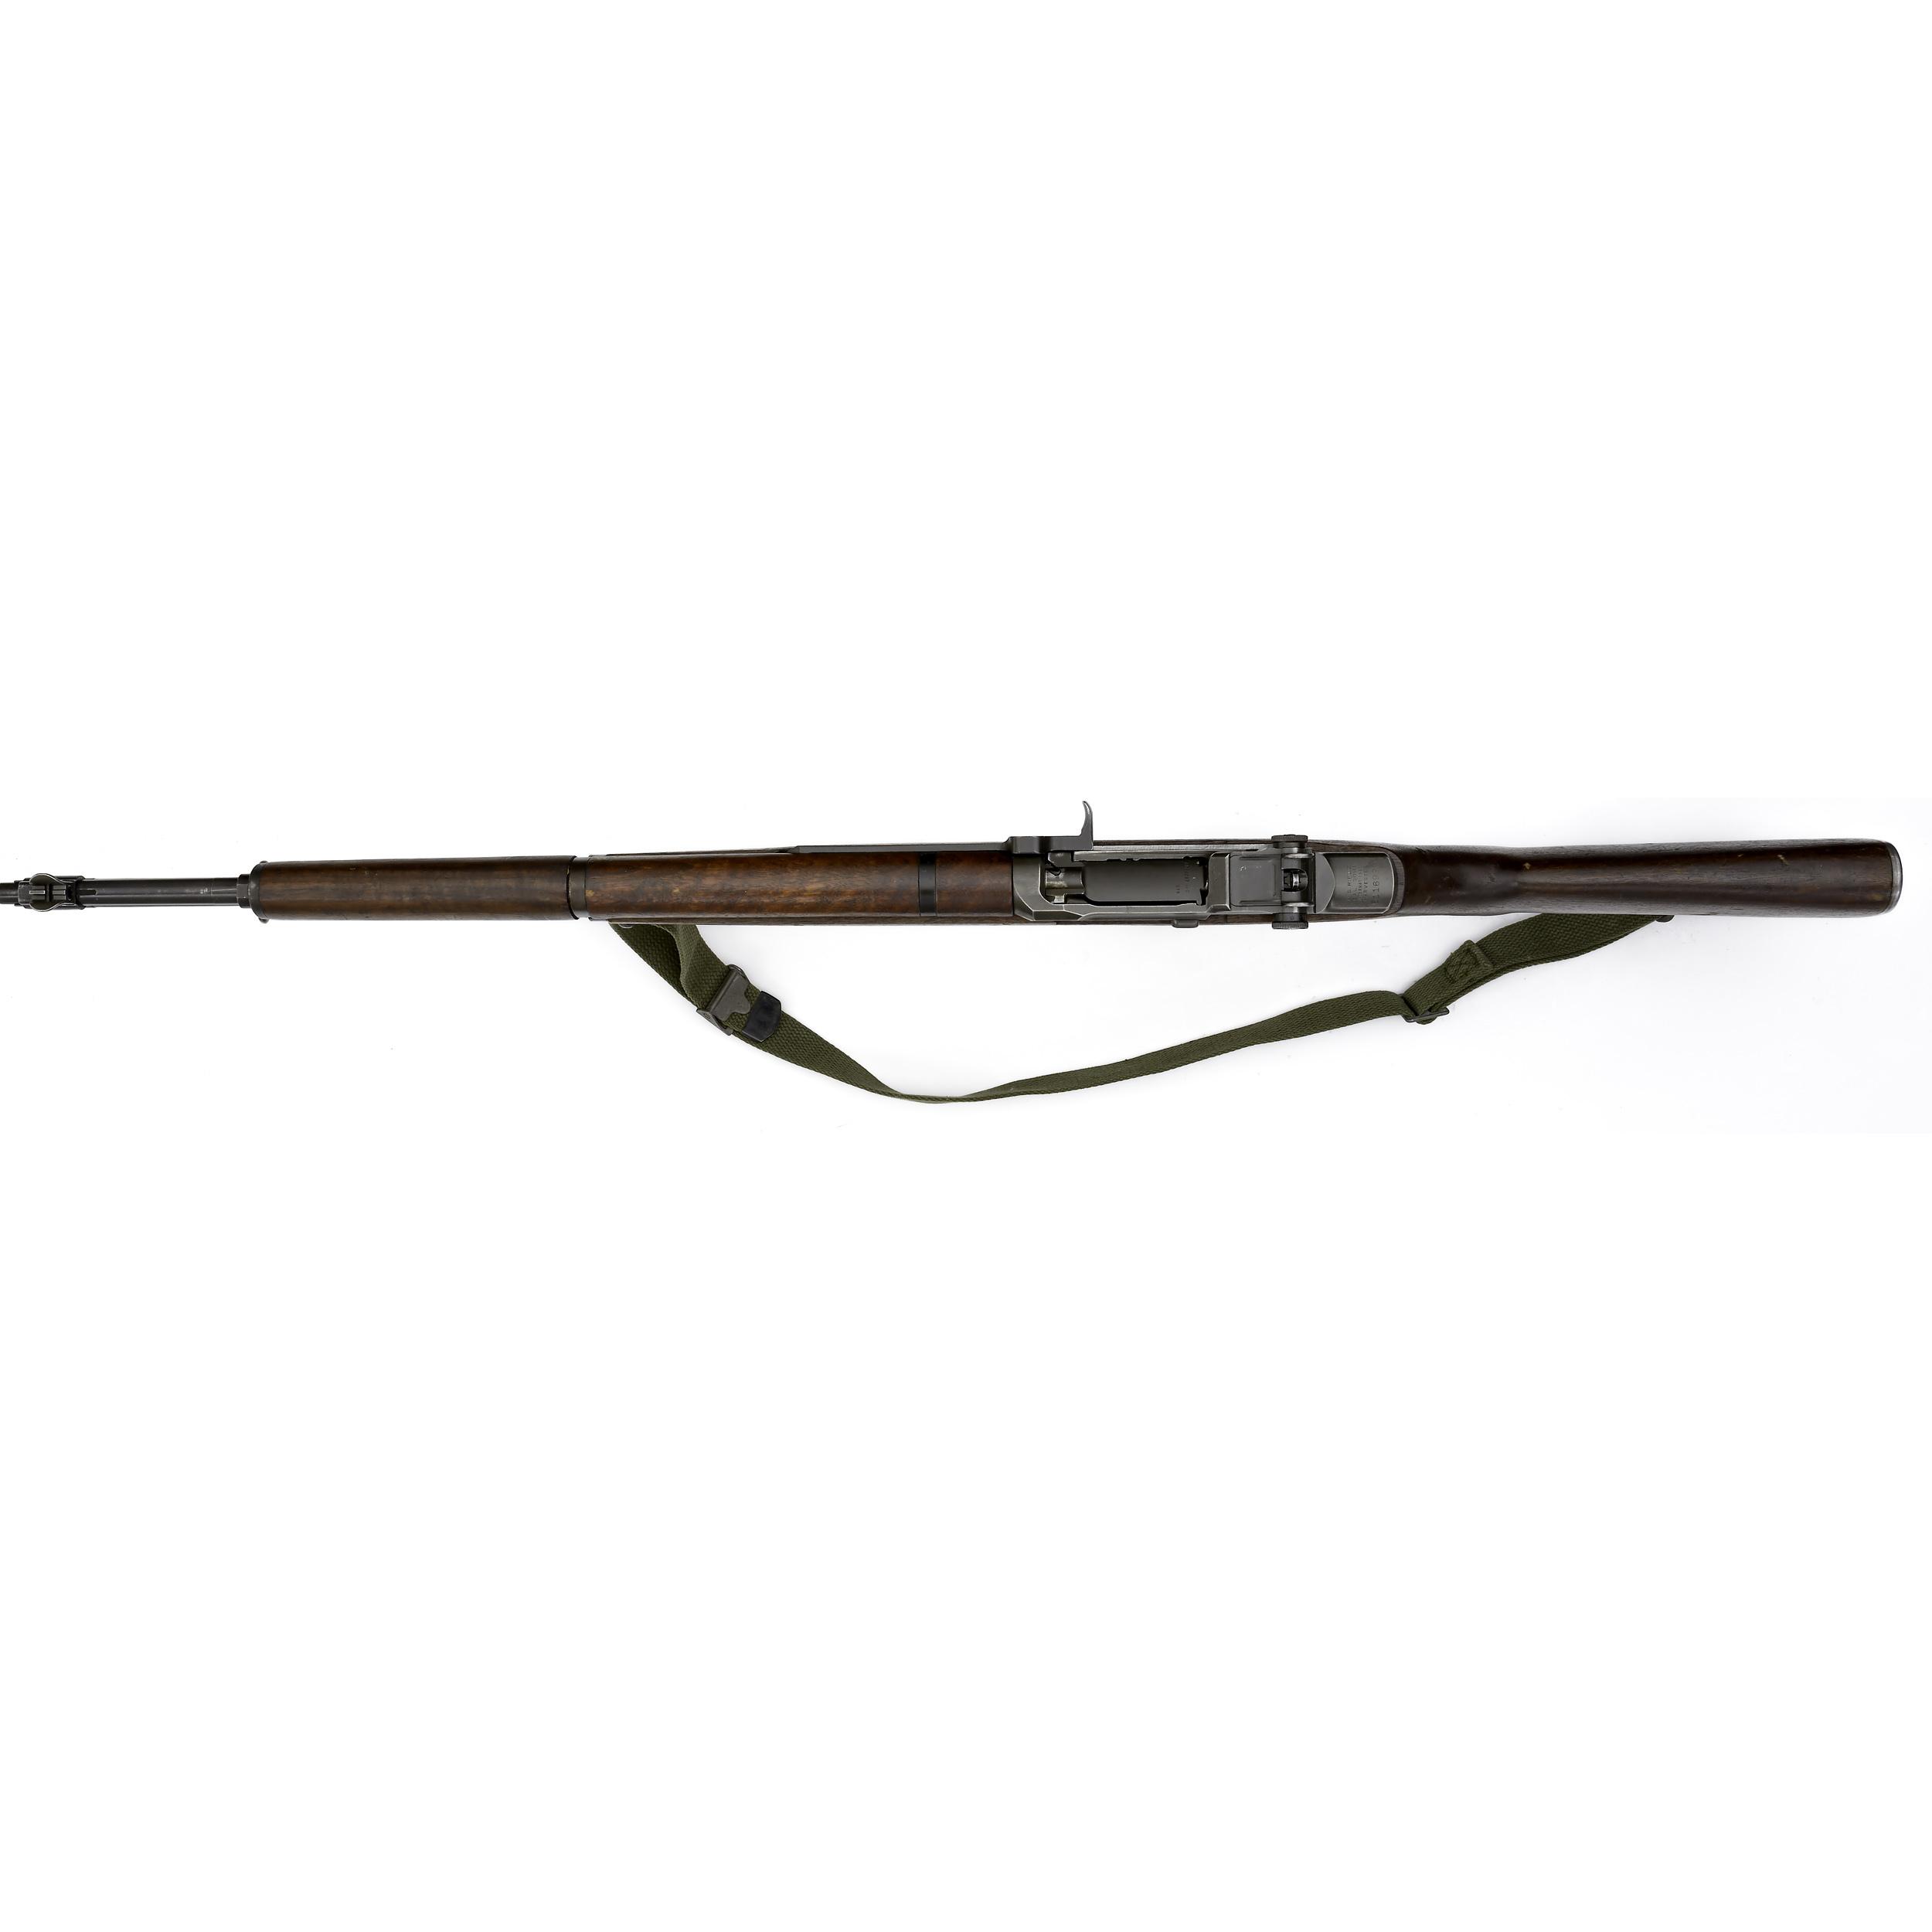 U S M1 Garand Rifle By International Harvester